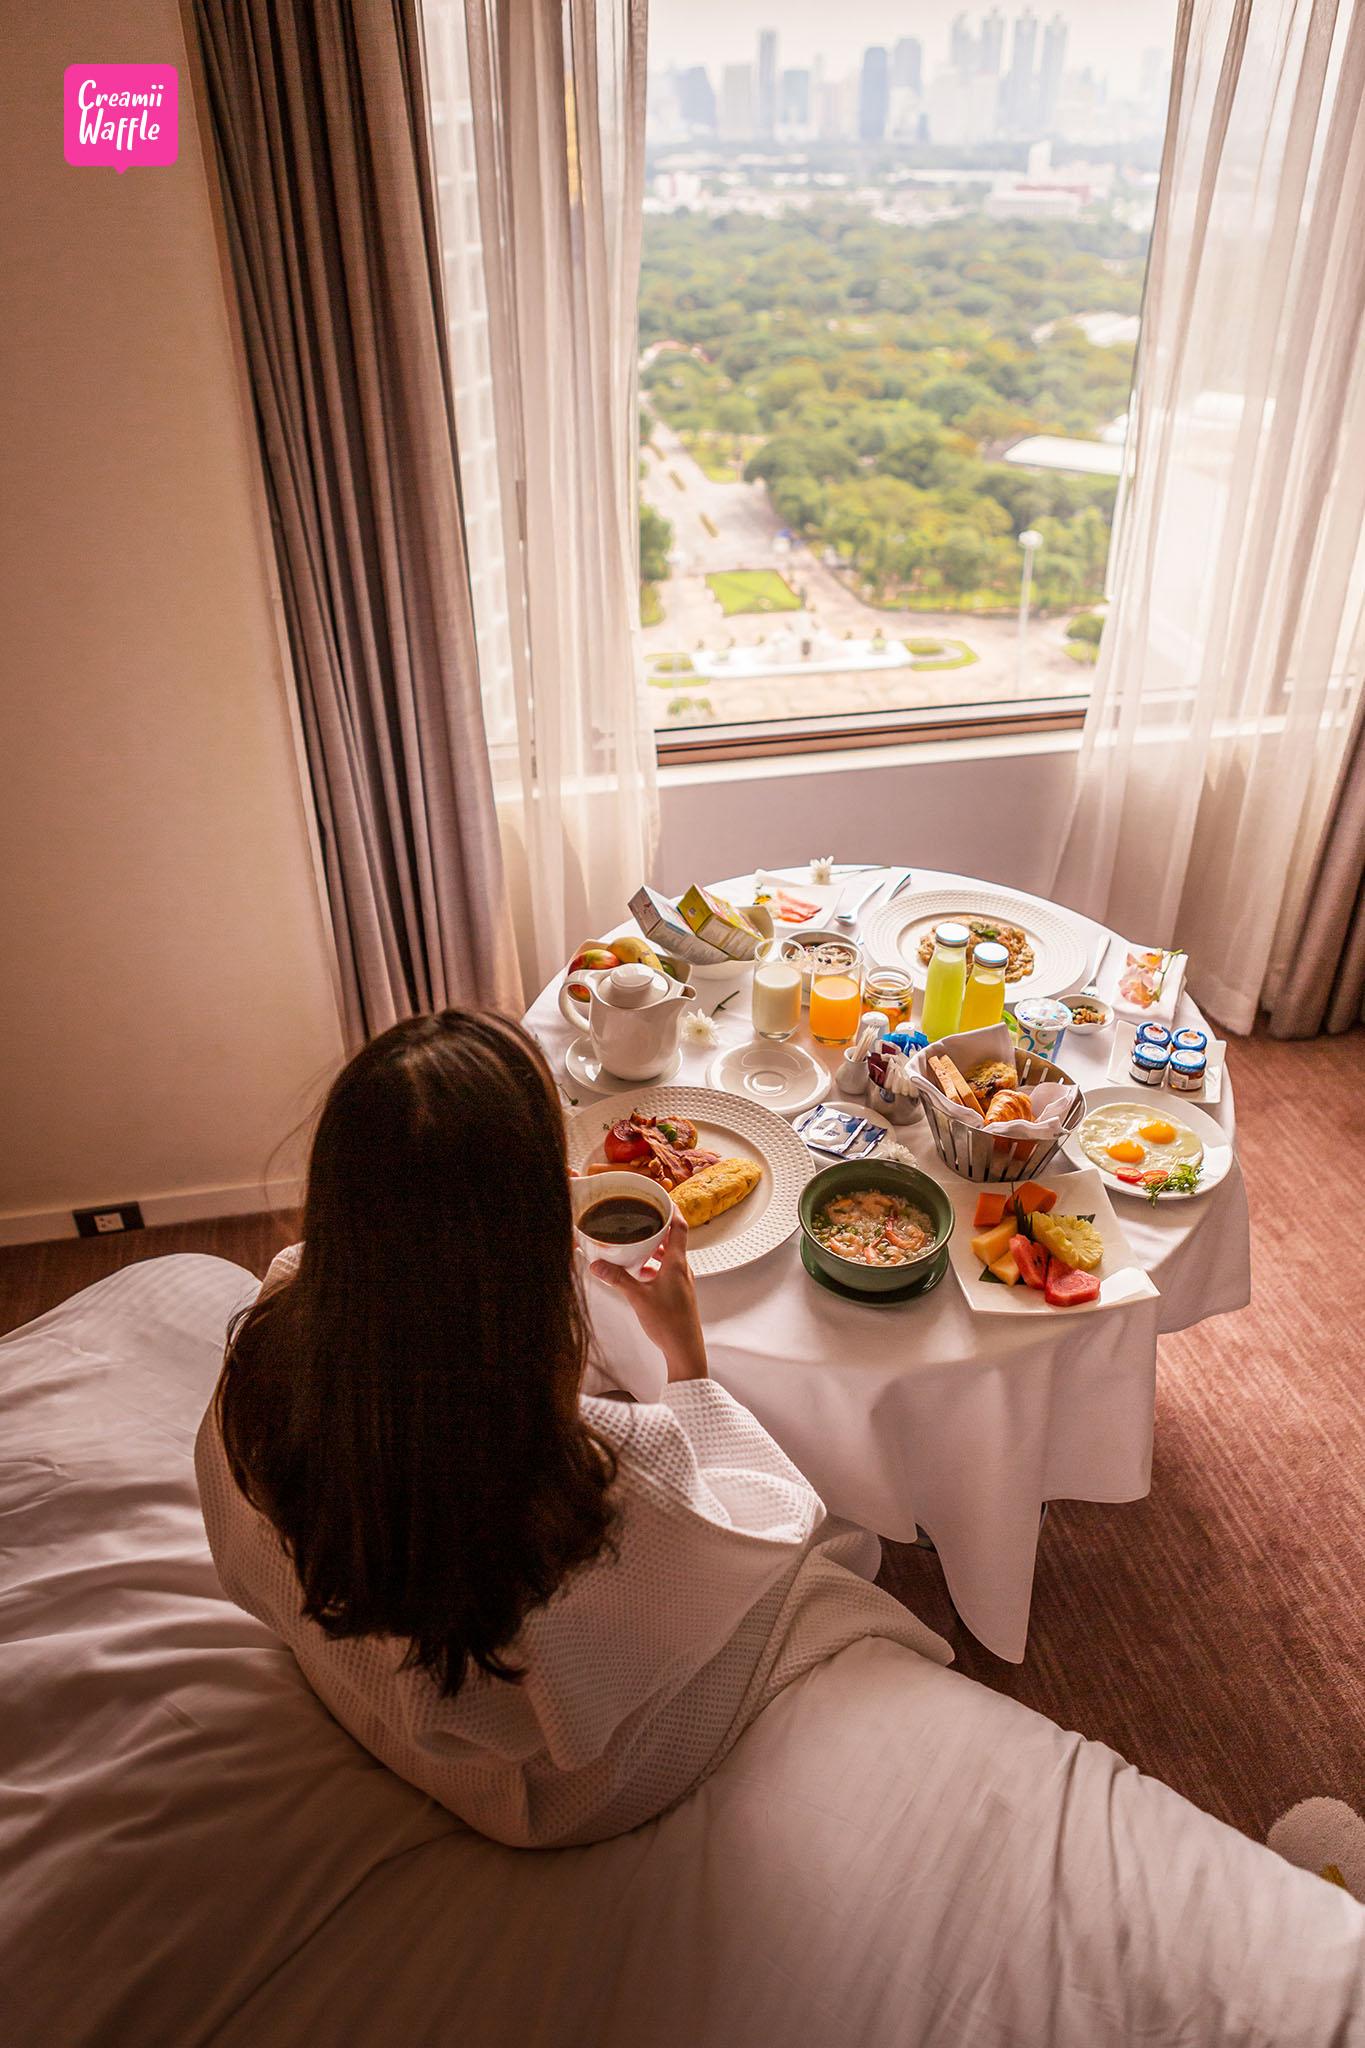 crowne plaza Bangkok Breakfast in bed